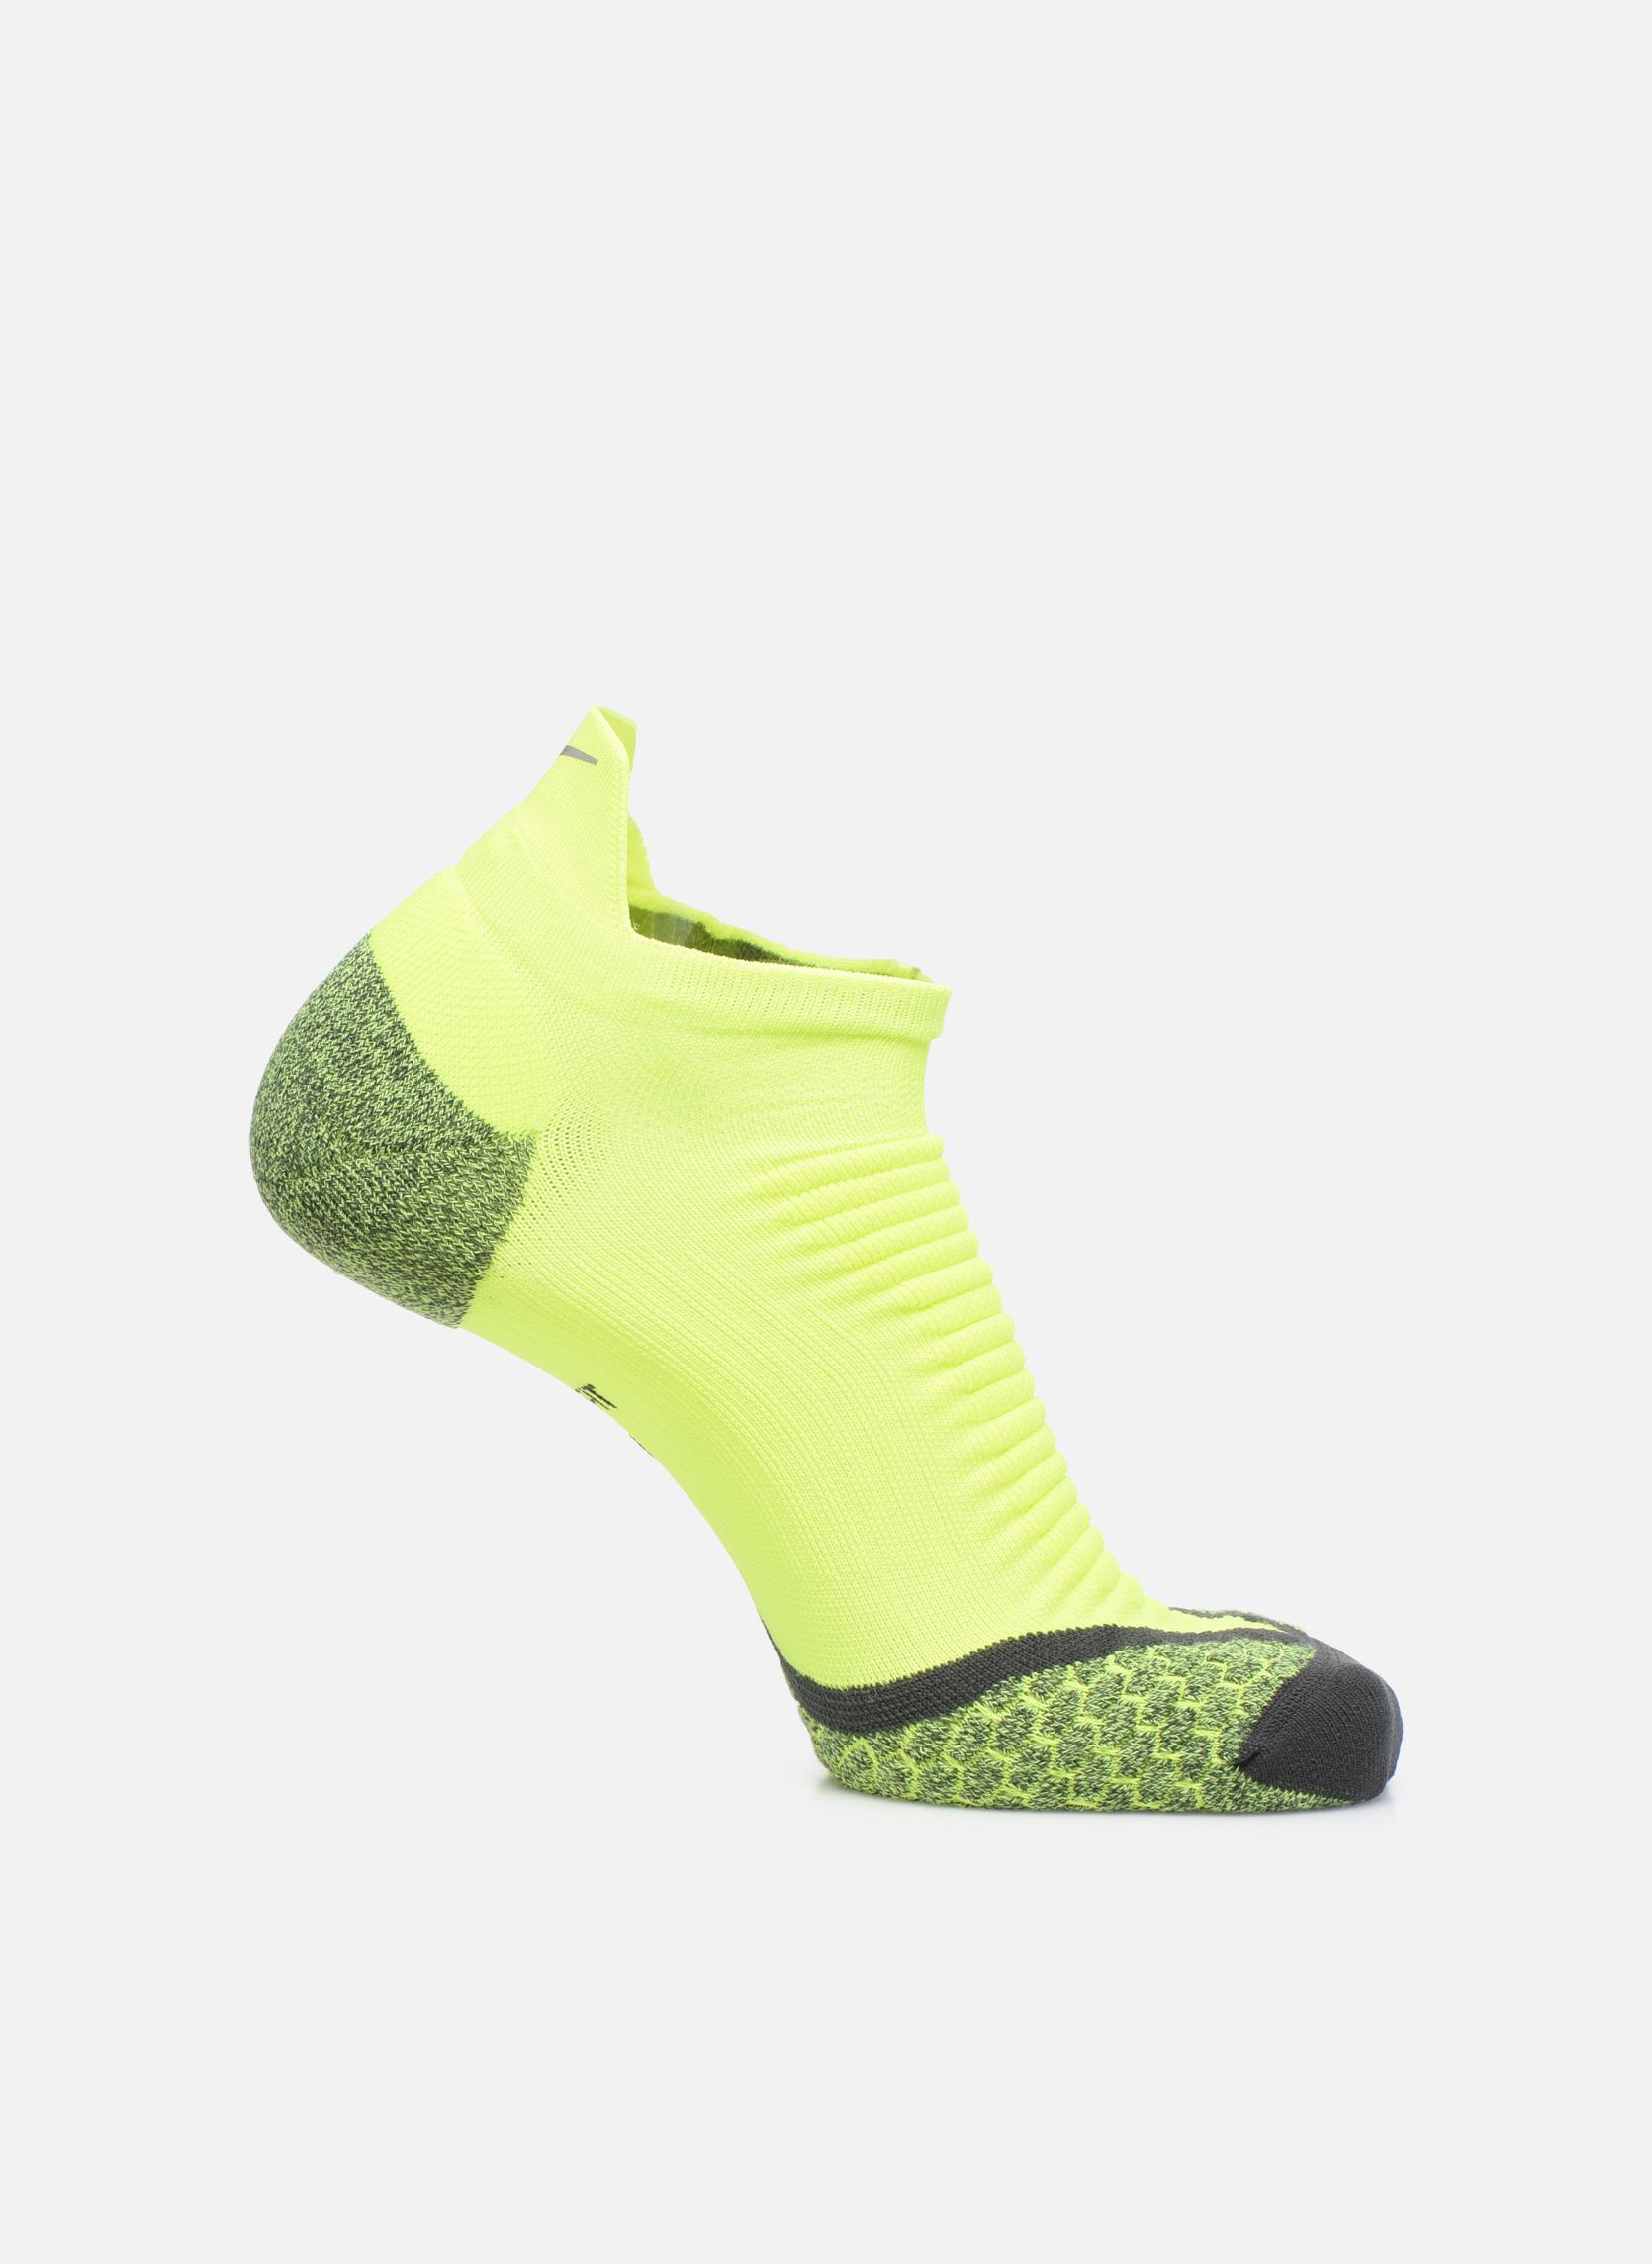 Nike Elite Cushioned No-Show Tab Running Sock by Nike - nike - sarenza.it